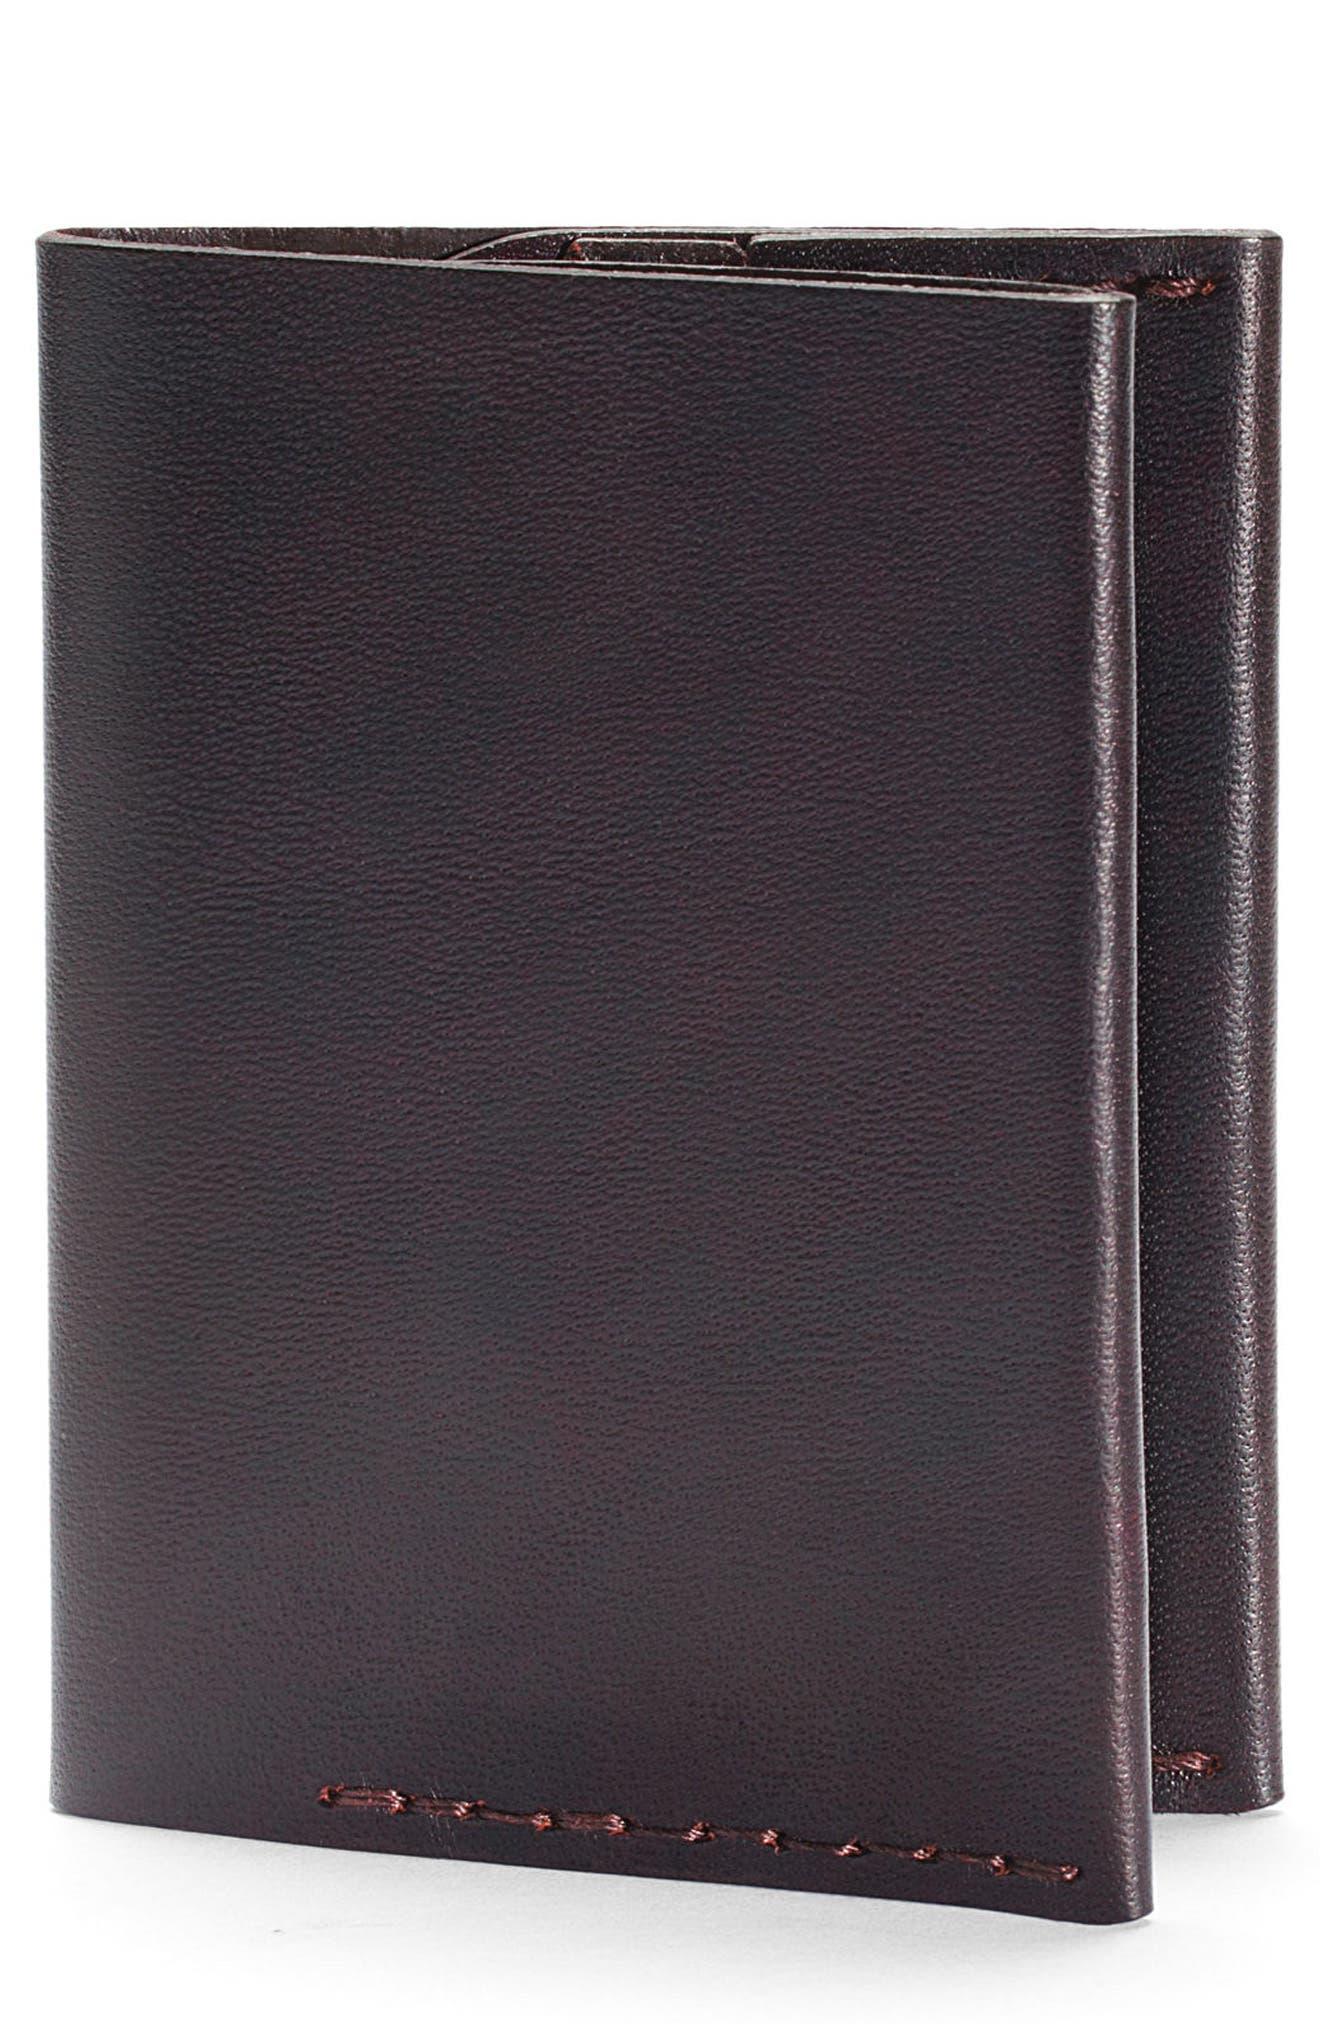 No. 4 Leather Wallet,                             Main thumbnail 1, color,                             MALBEC